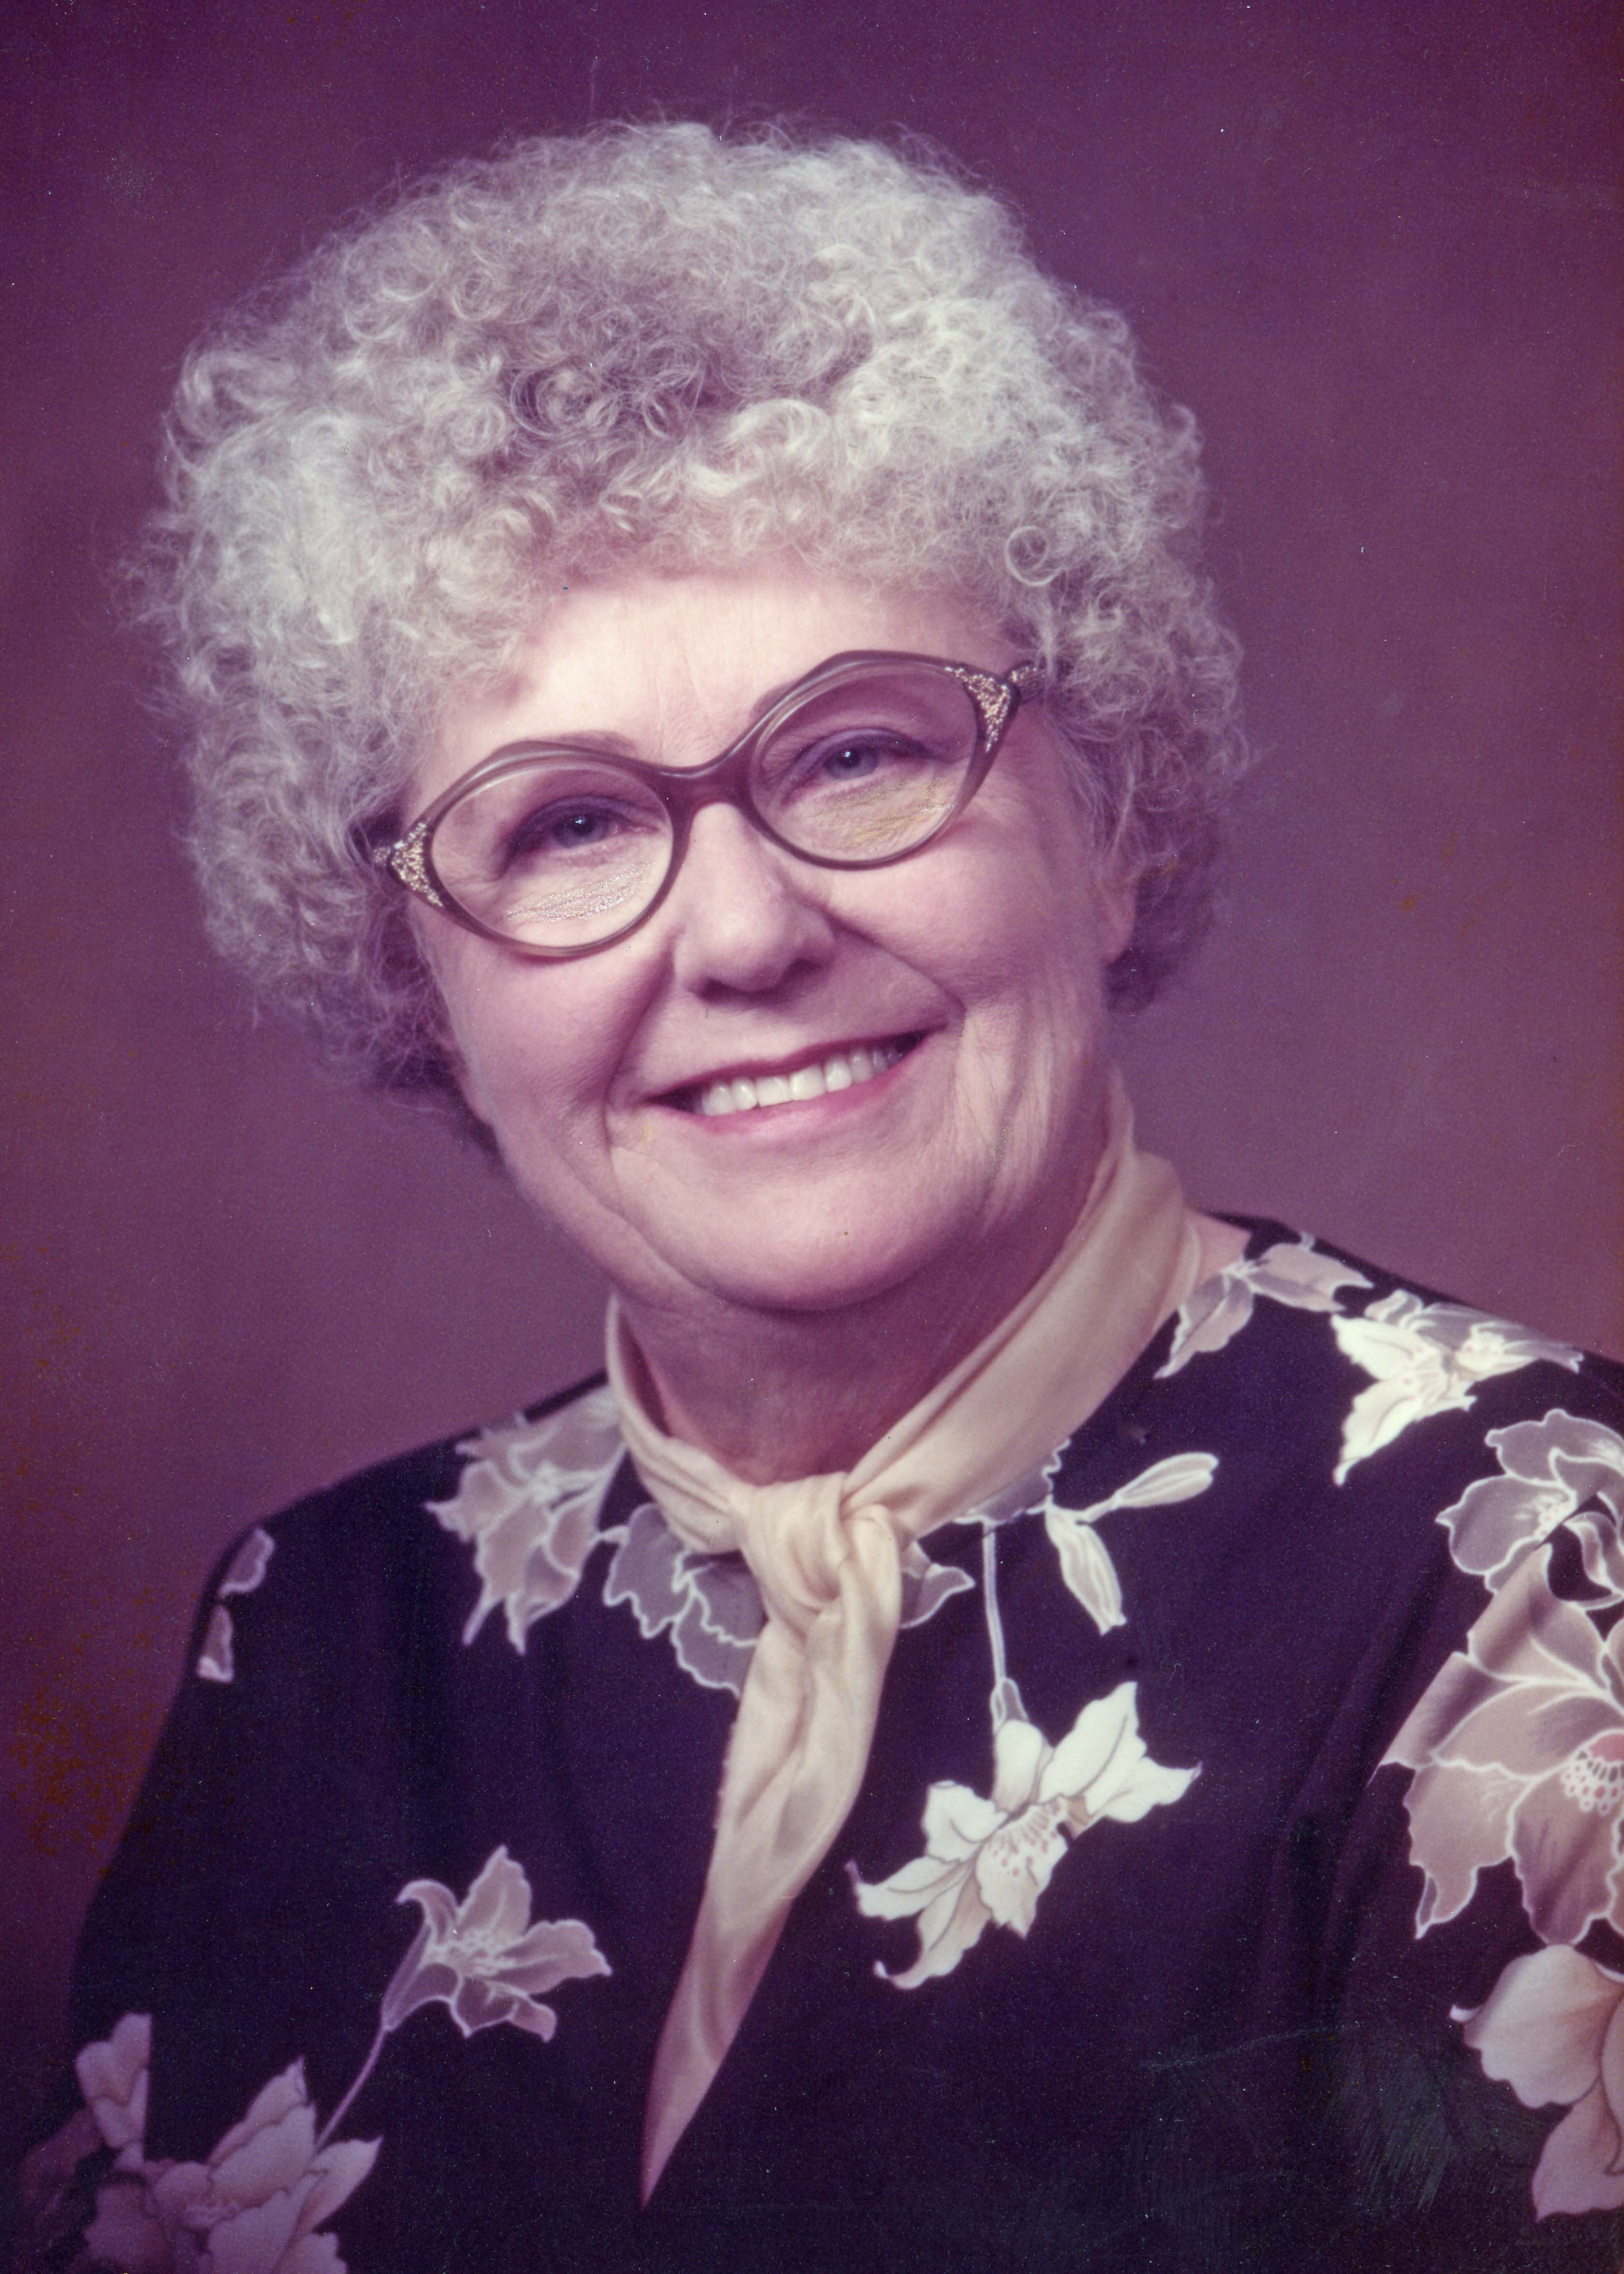 Terry Baue W. - Virginia Homes Funeral